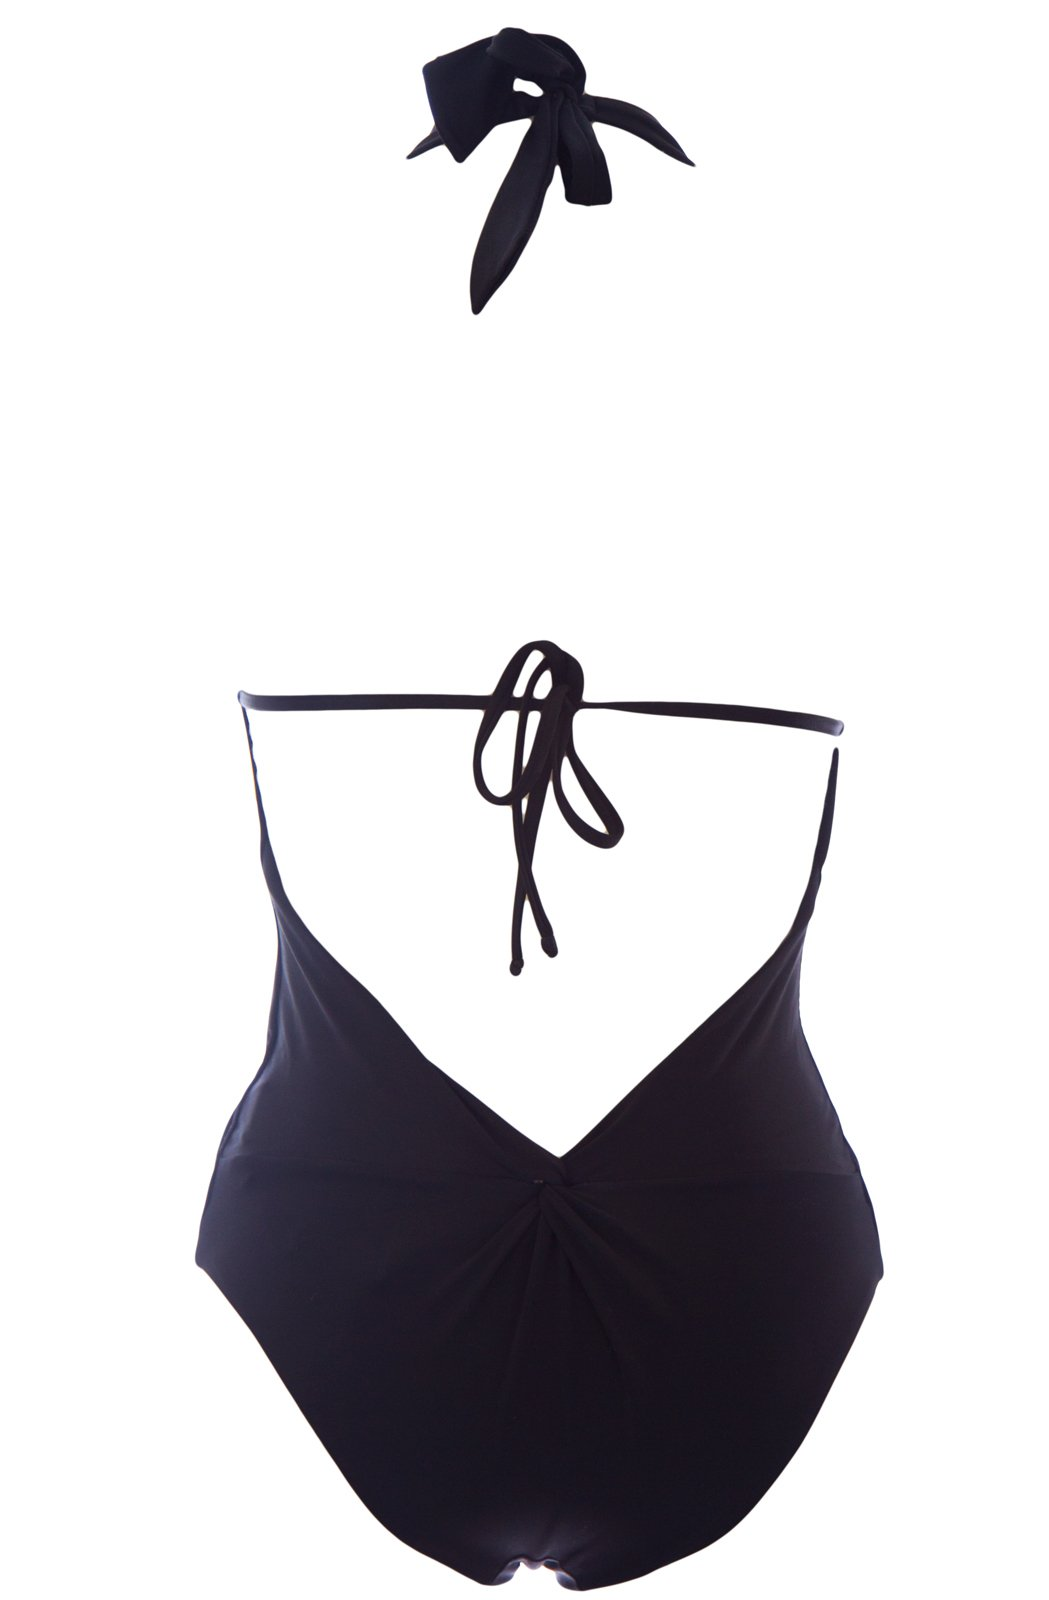 Giorgio Armani Women's One-Piece Halter Swimsuit with Straps Medium Black by GIORGIO ARMANI (Image #2)